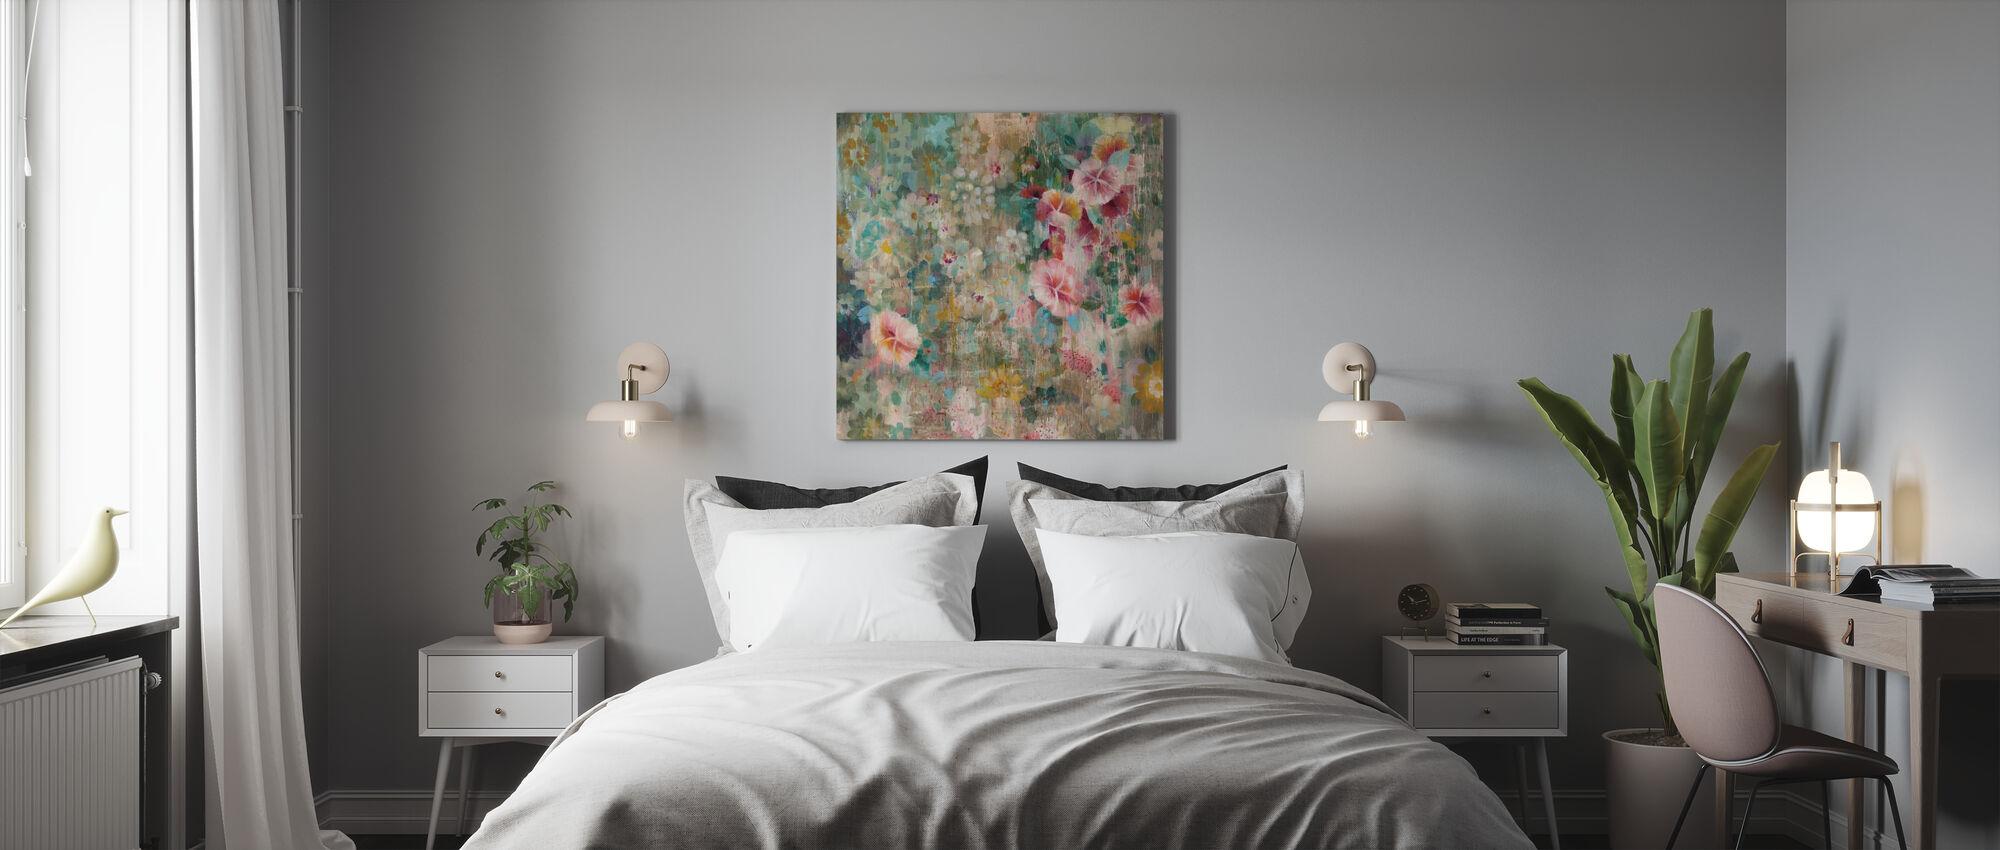 Bloem Douche - Canvas print - Slaapkamer